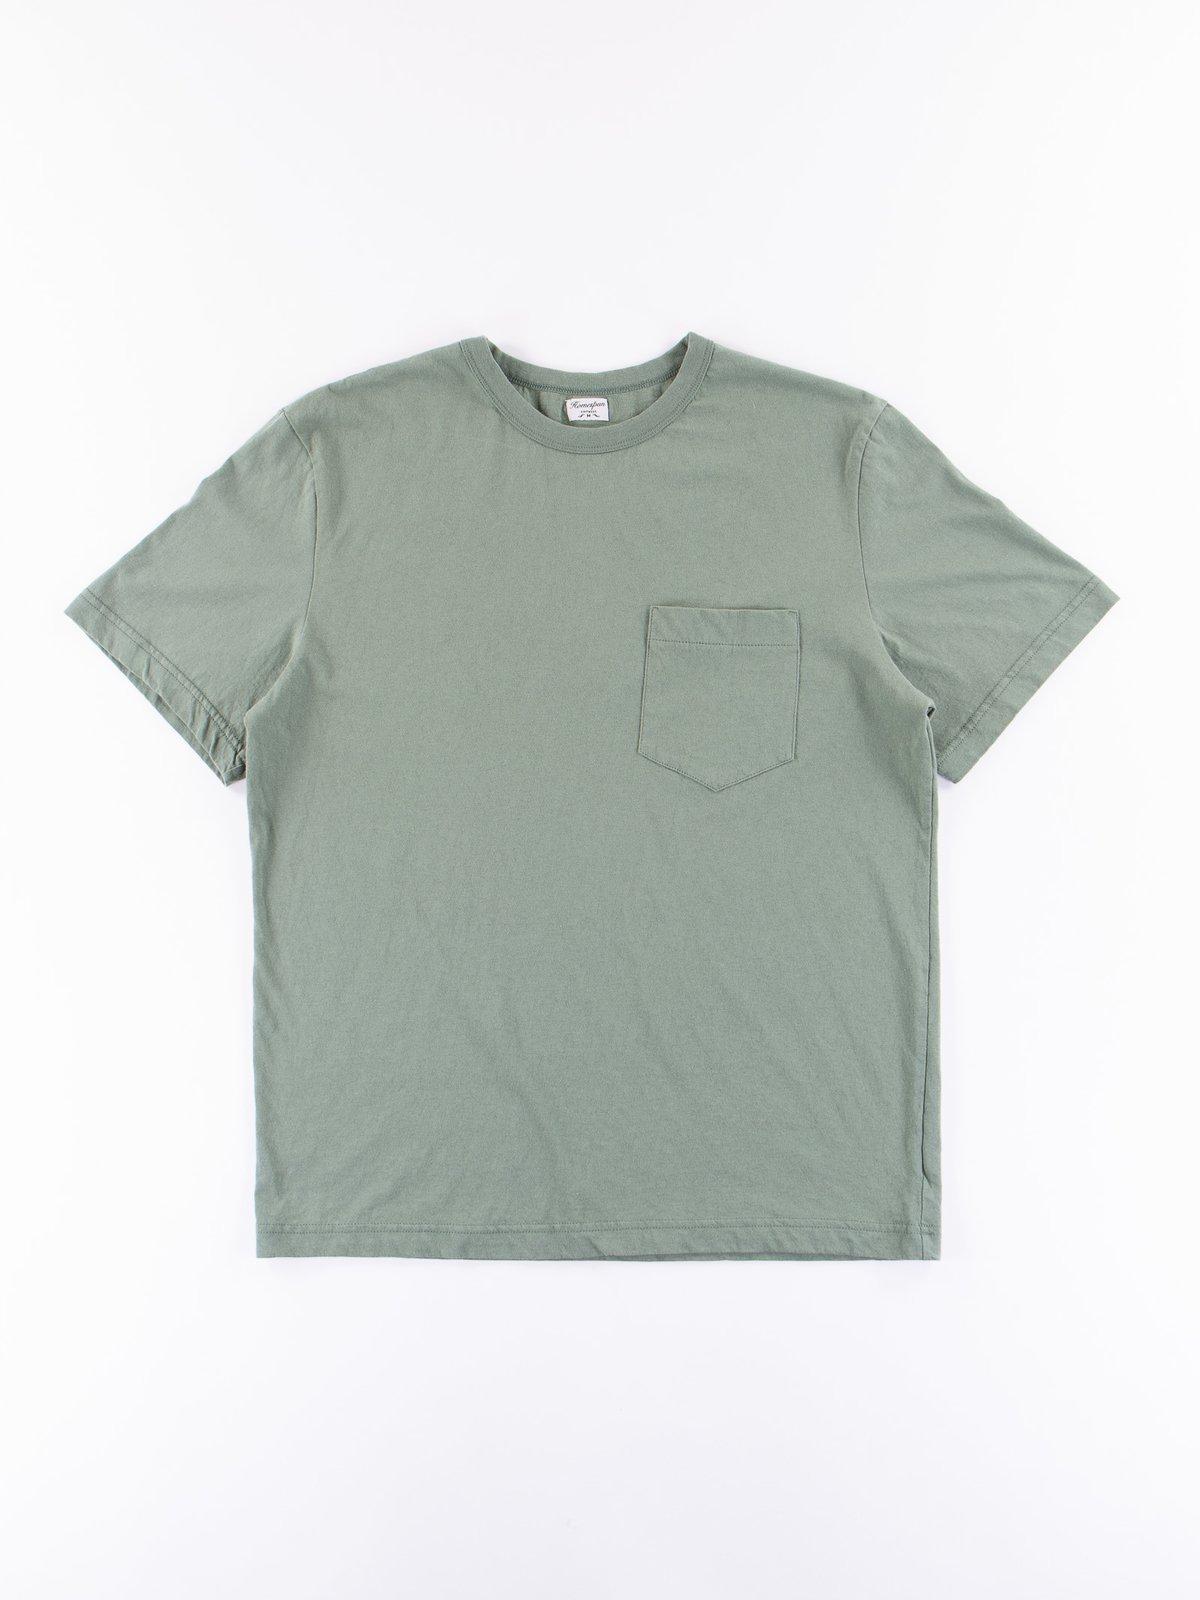 Green Dad's Pocket Tee - Image 1